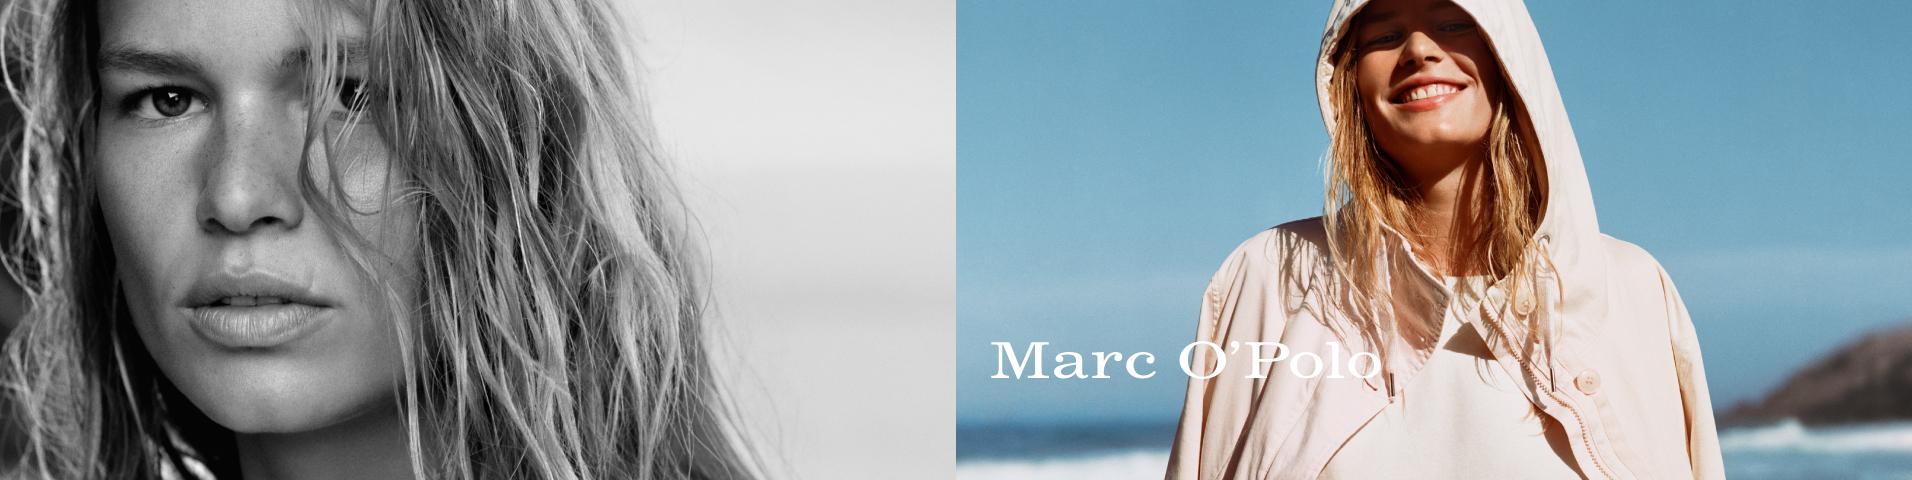 96a5503cd7 Marc O'Polo Damen Jeans | Entdecke deine perfekte Jeans online bei ...